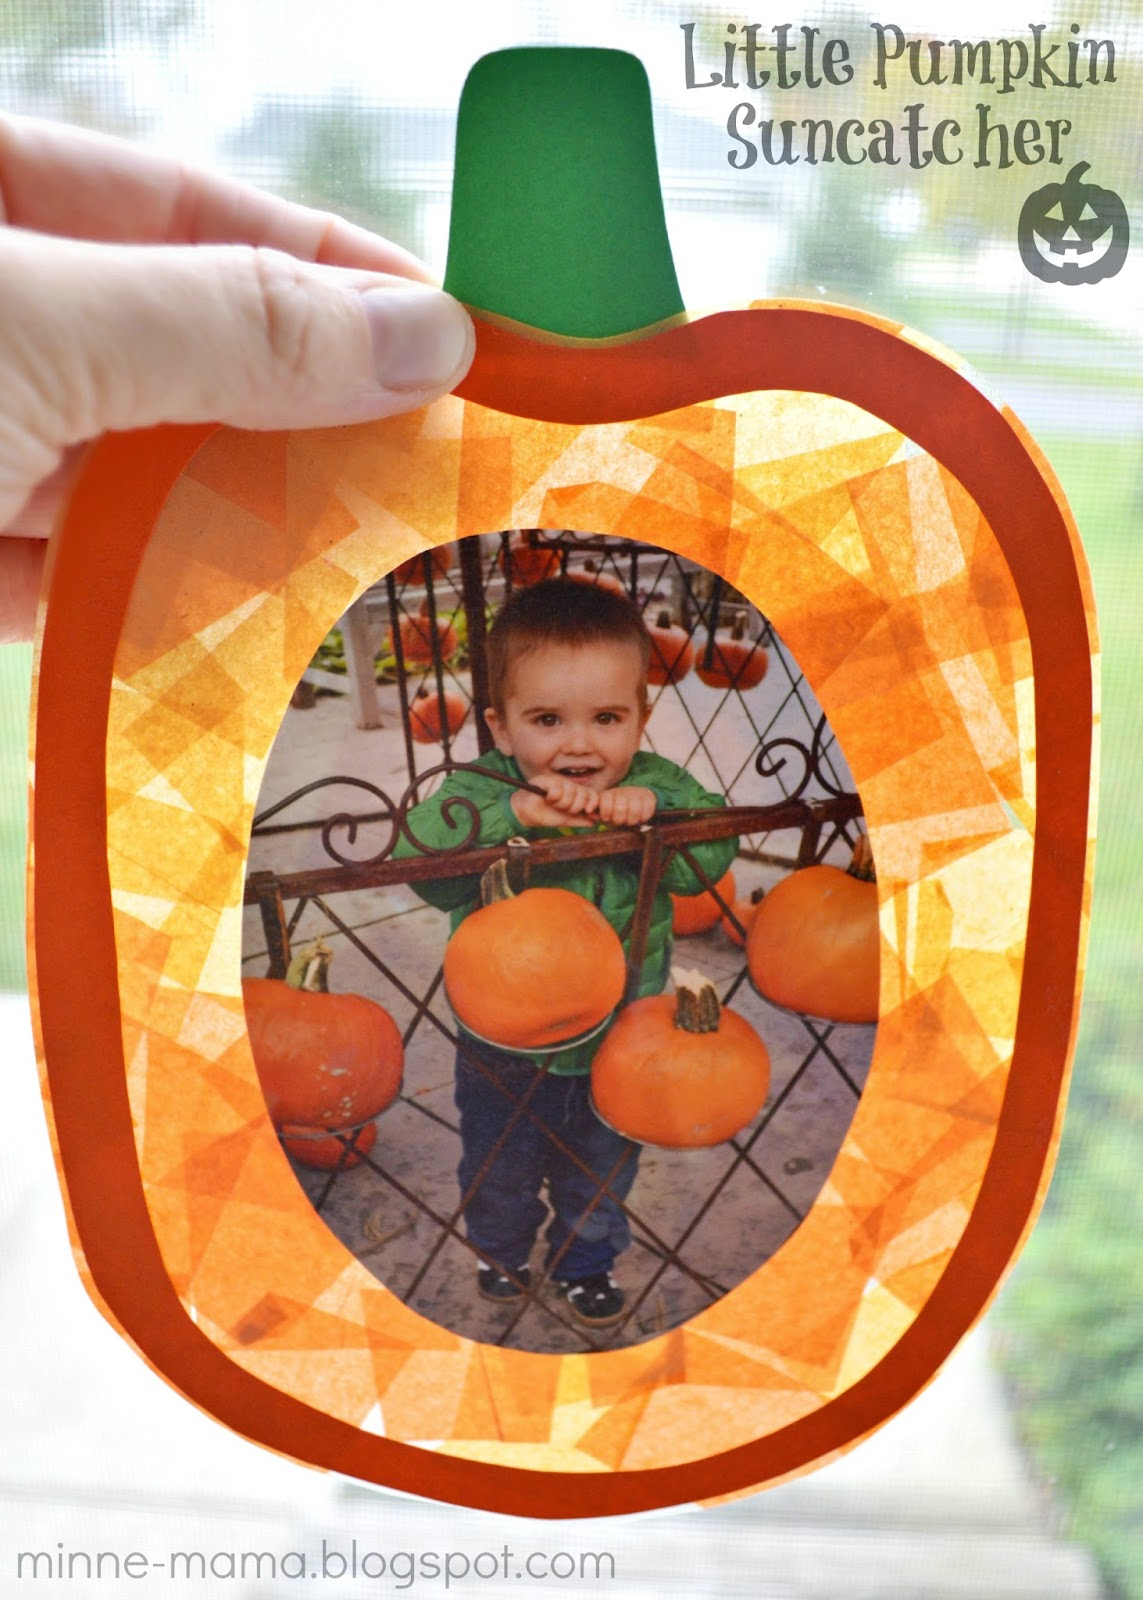 23 Adorable Pumpkin Crafts For Kids The Pinterested Parent